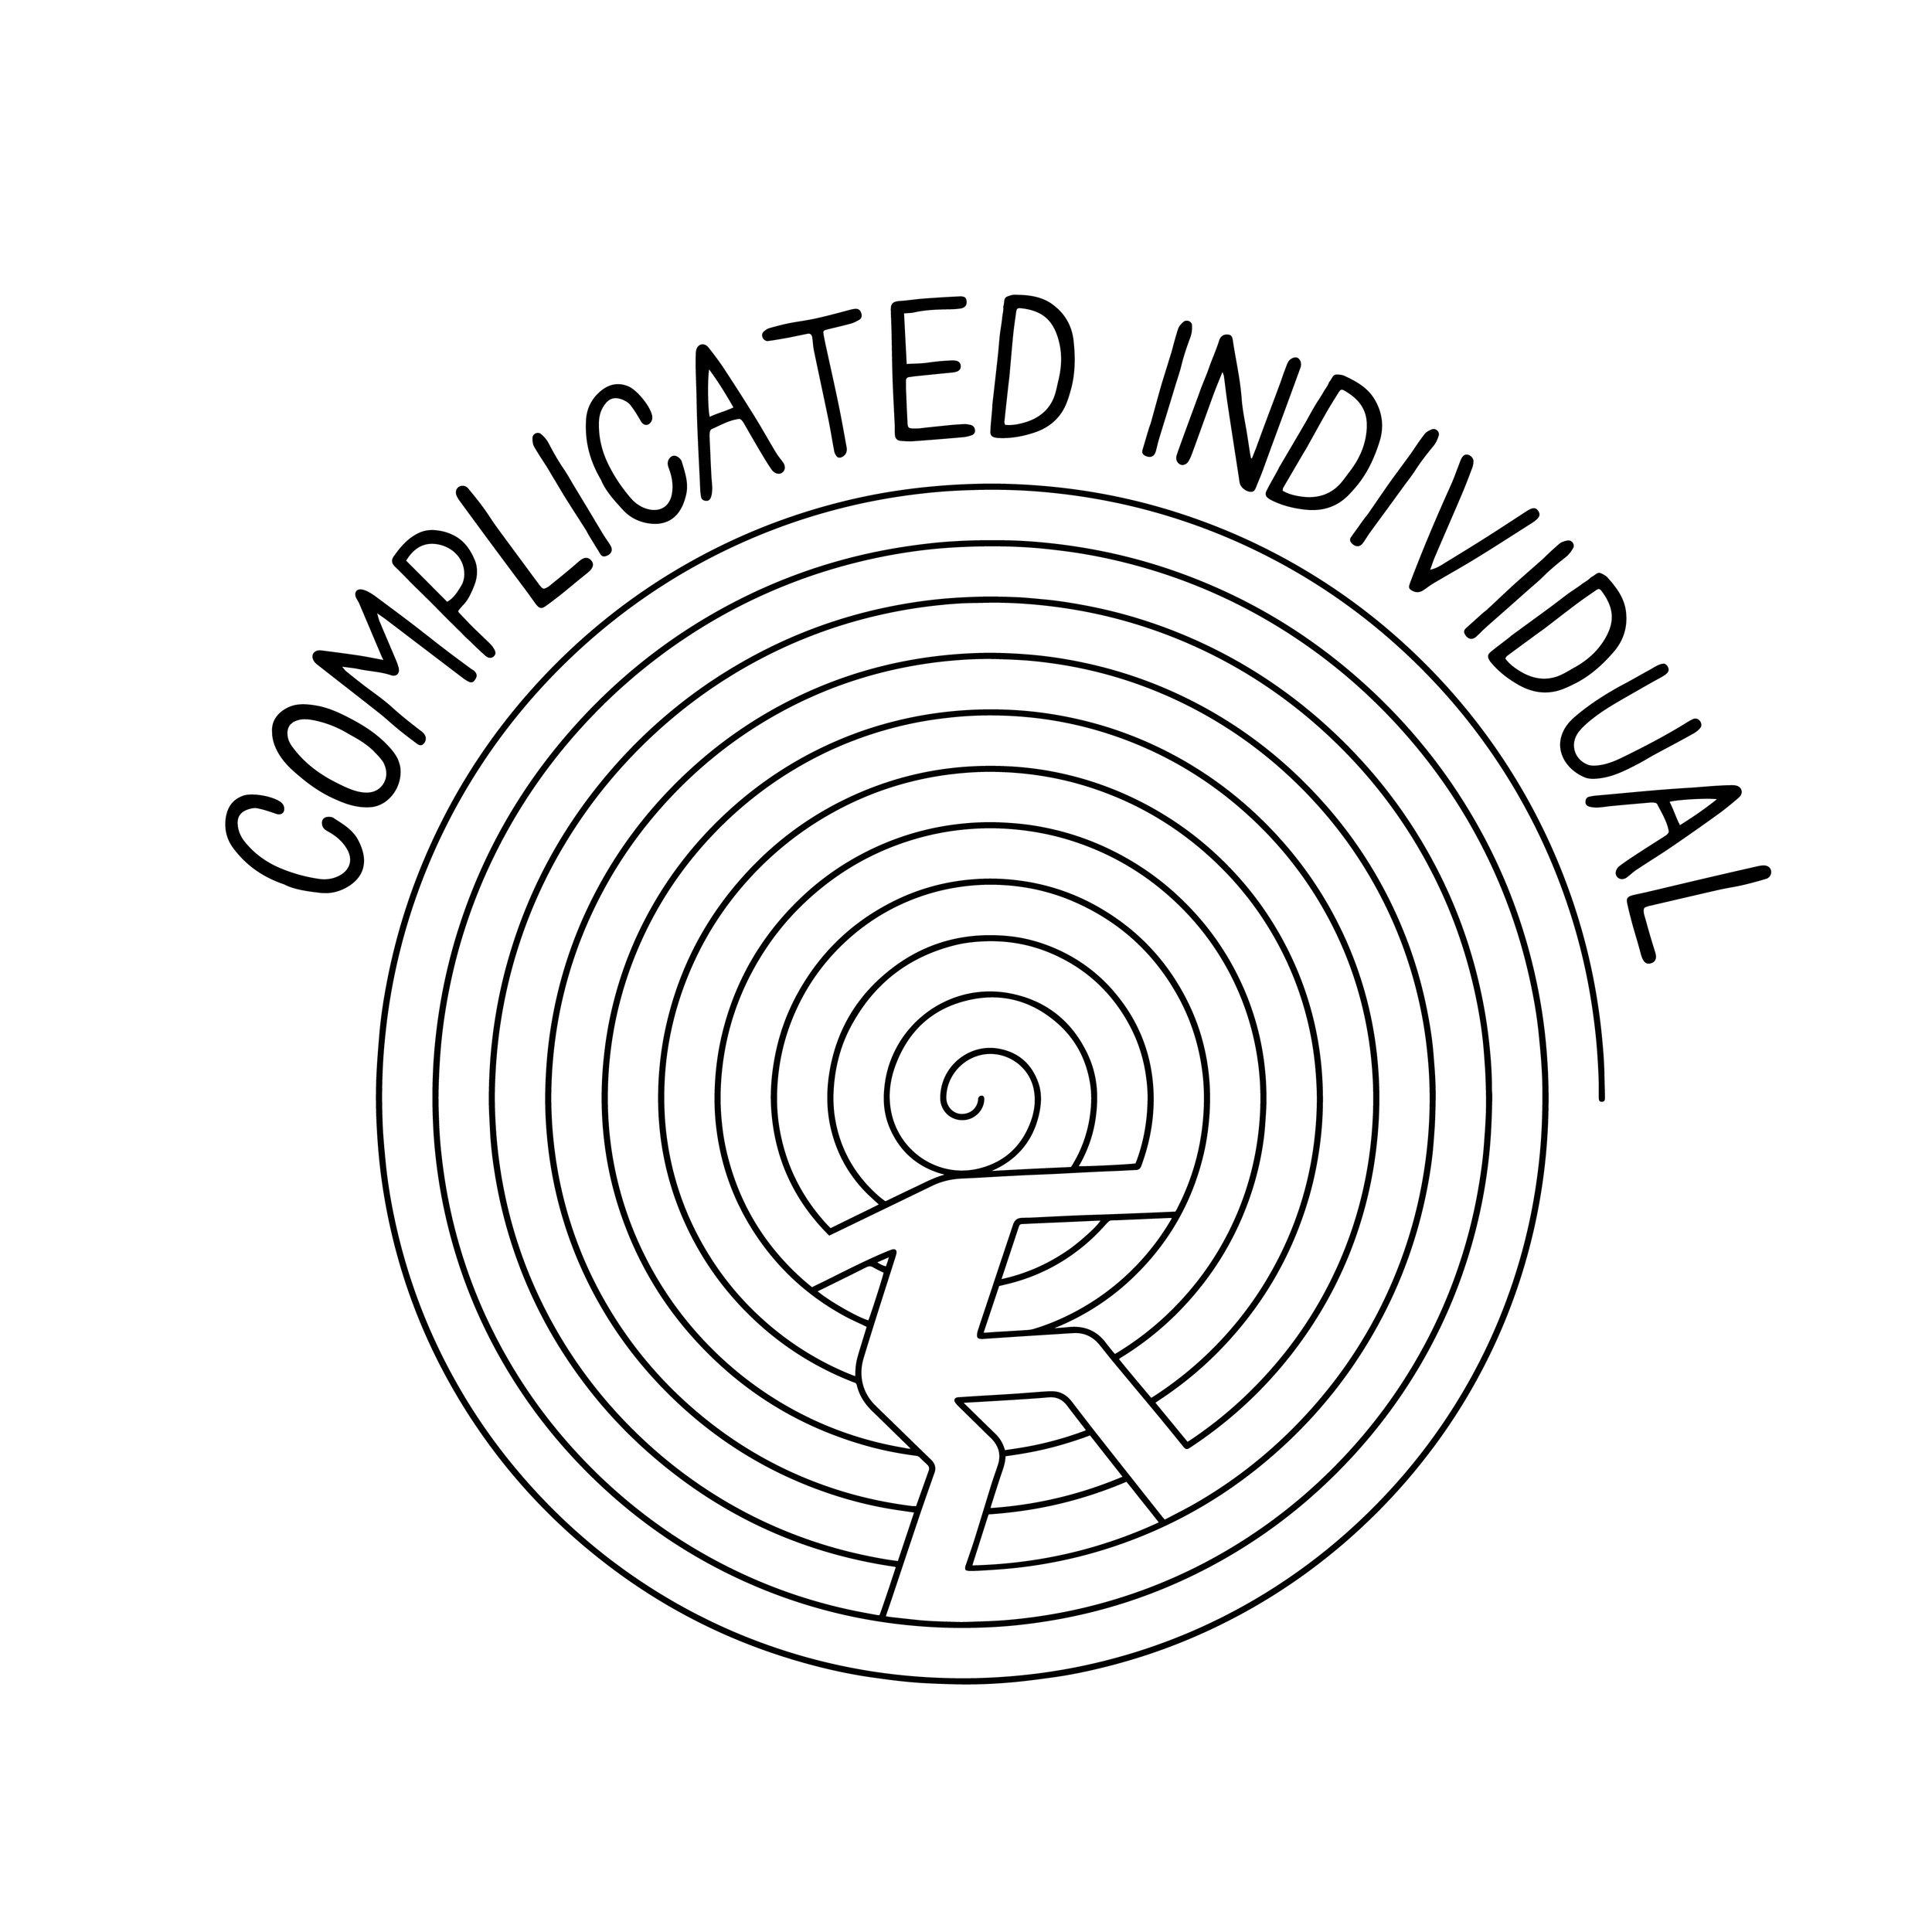 complicatedindividual-01.jpg